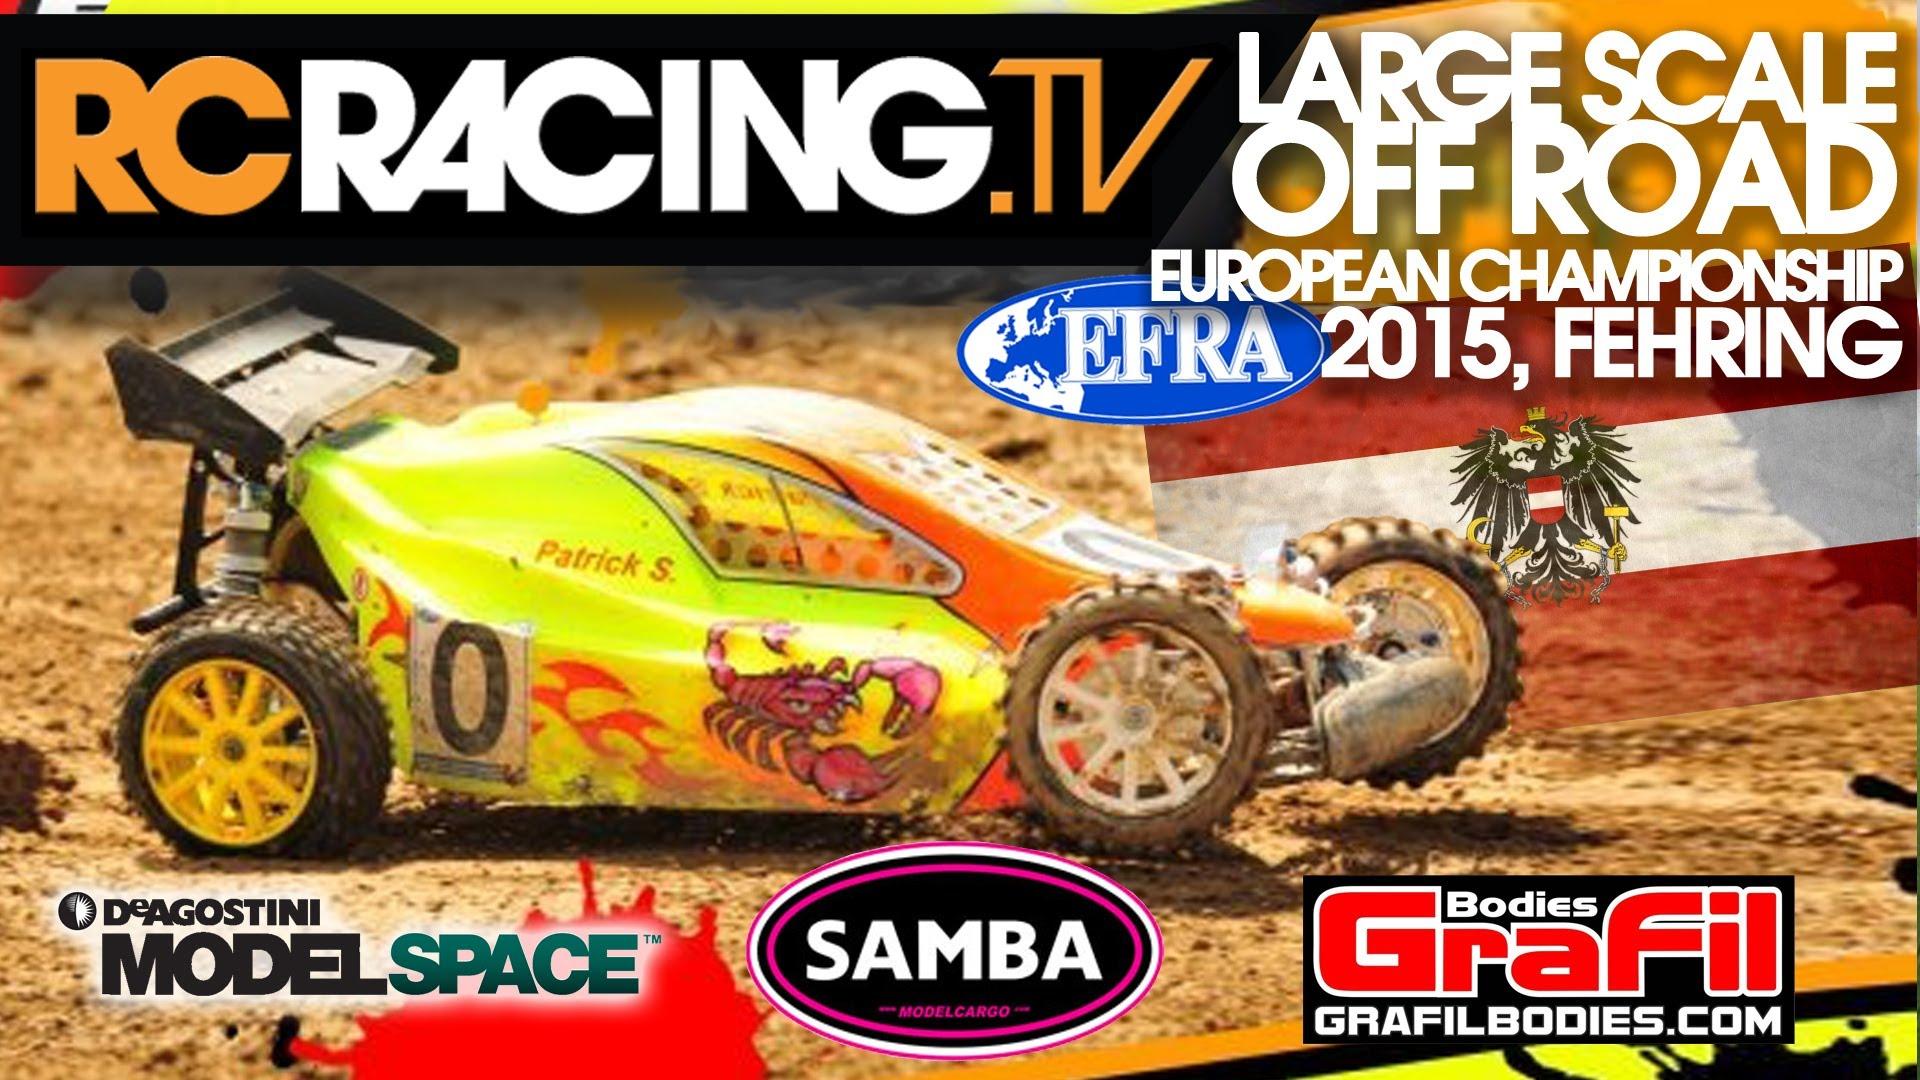 EFRA Large Scale Off Road Euros 2015 - Thursday Qualifying - Live